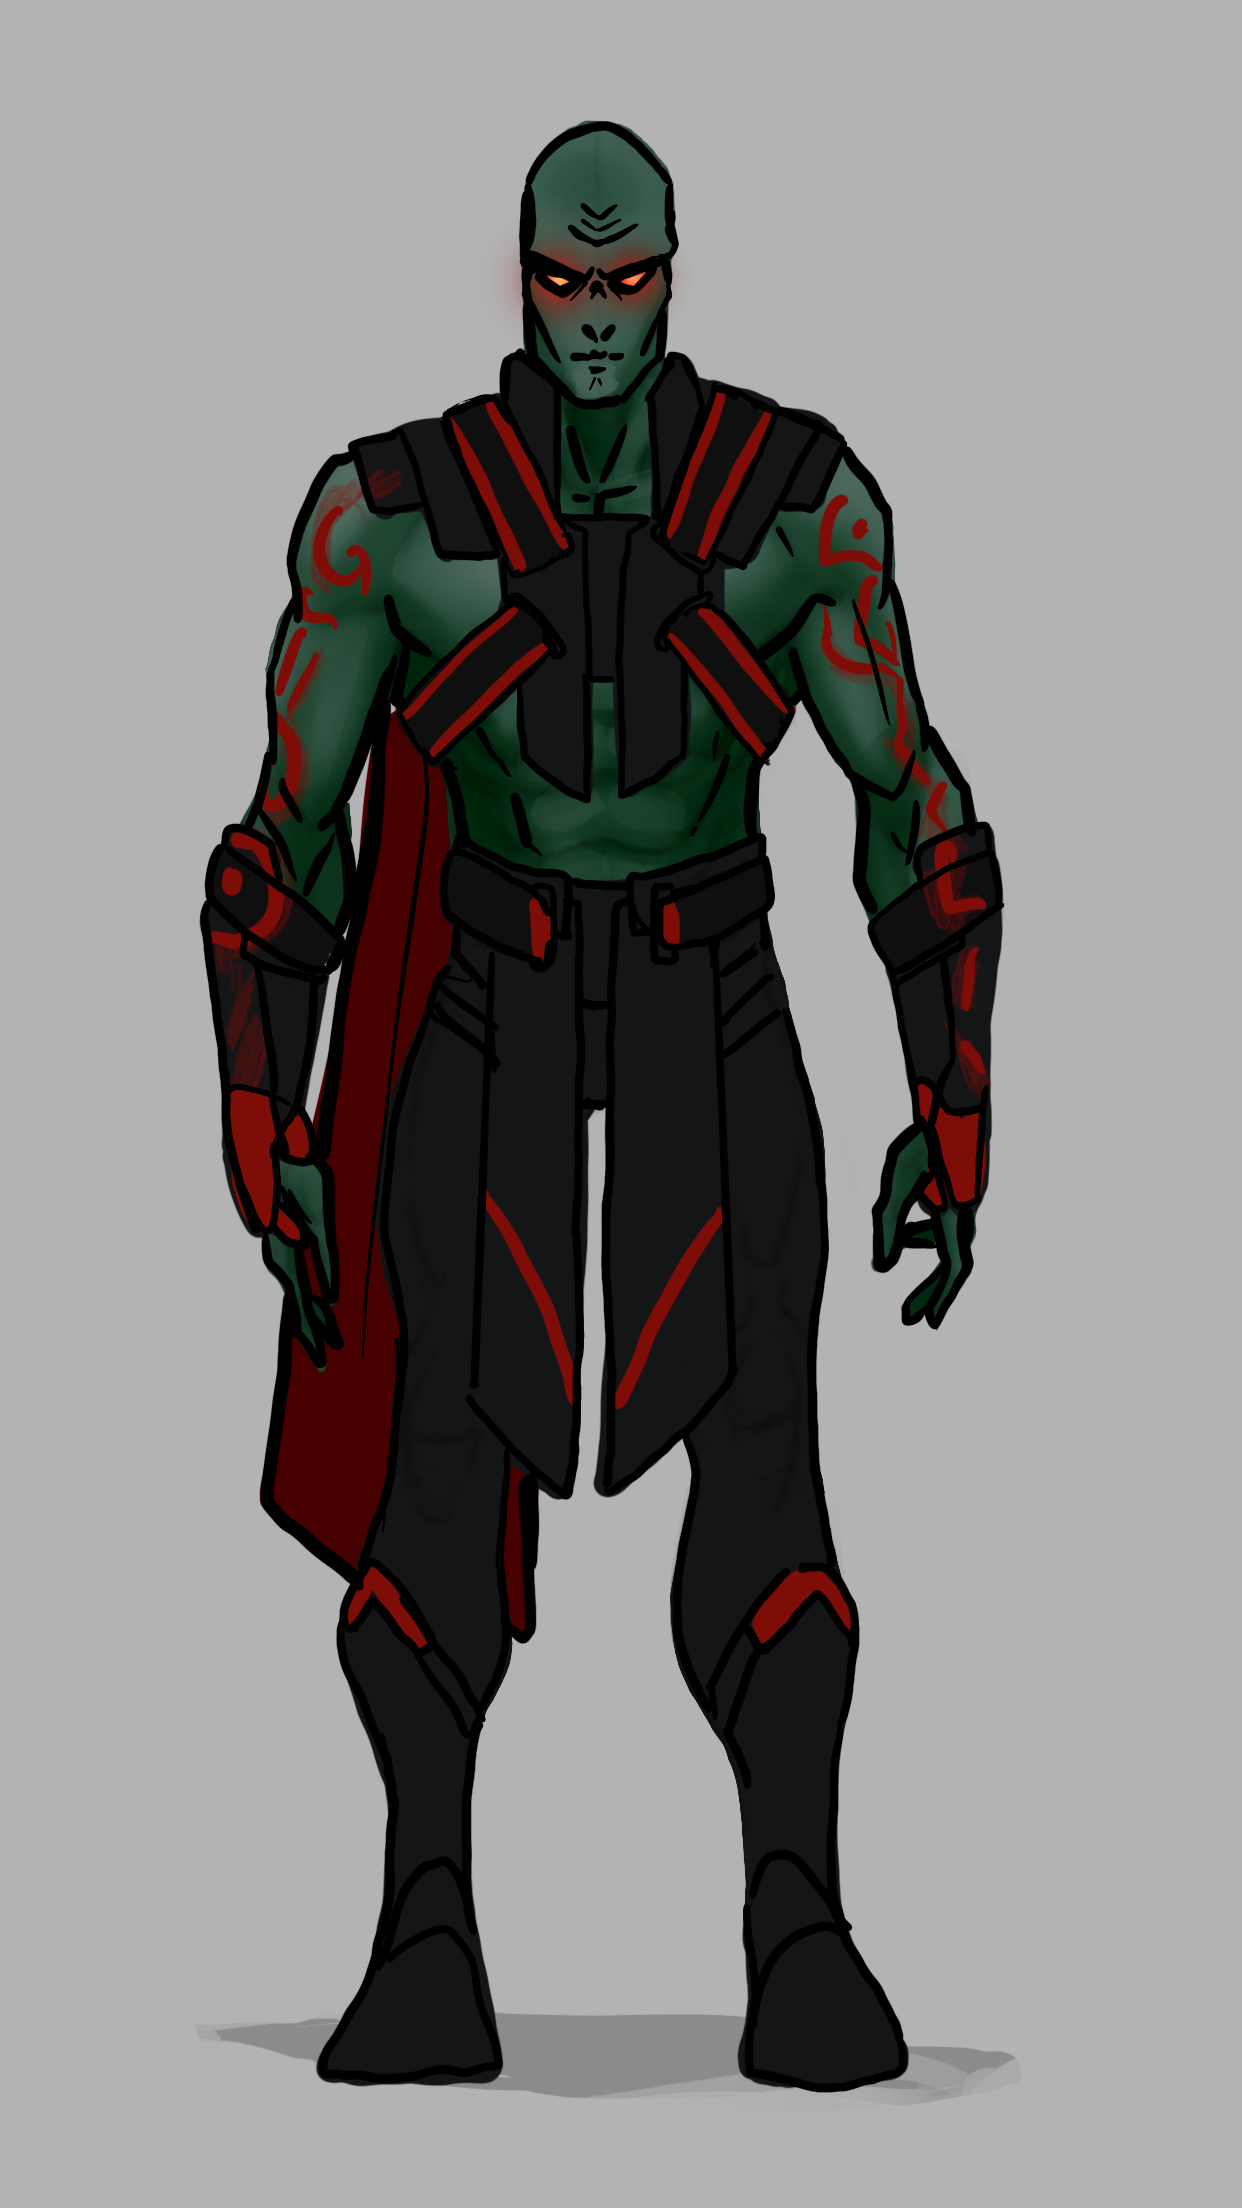 Martian Manhunter Comics Quick Redesign The Martian Superhero Art Marvel And Dc Characters